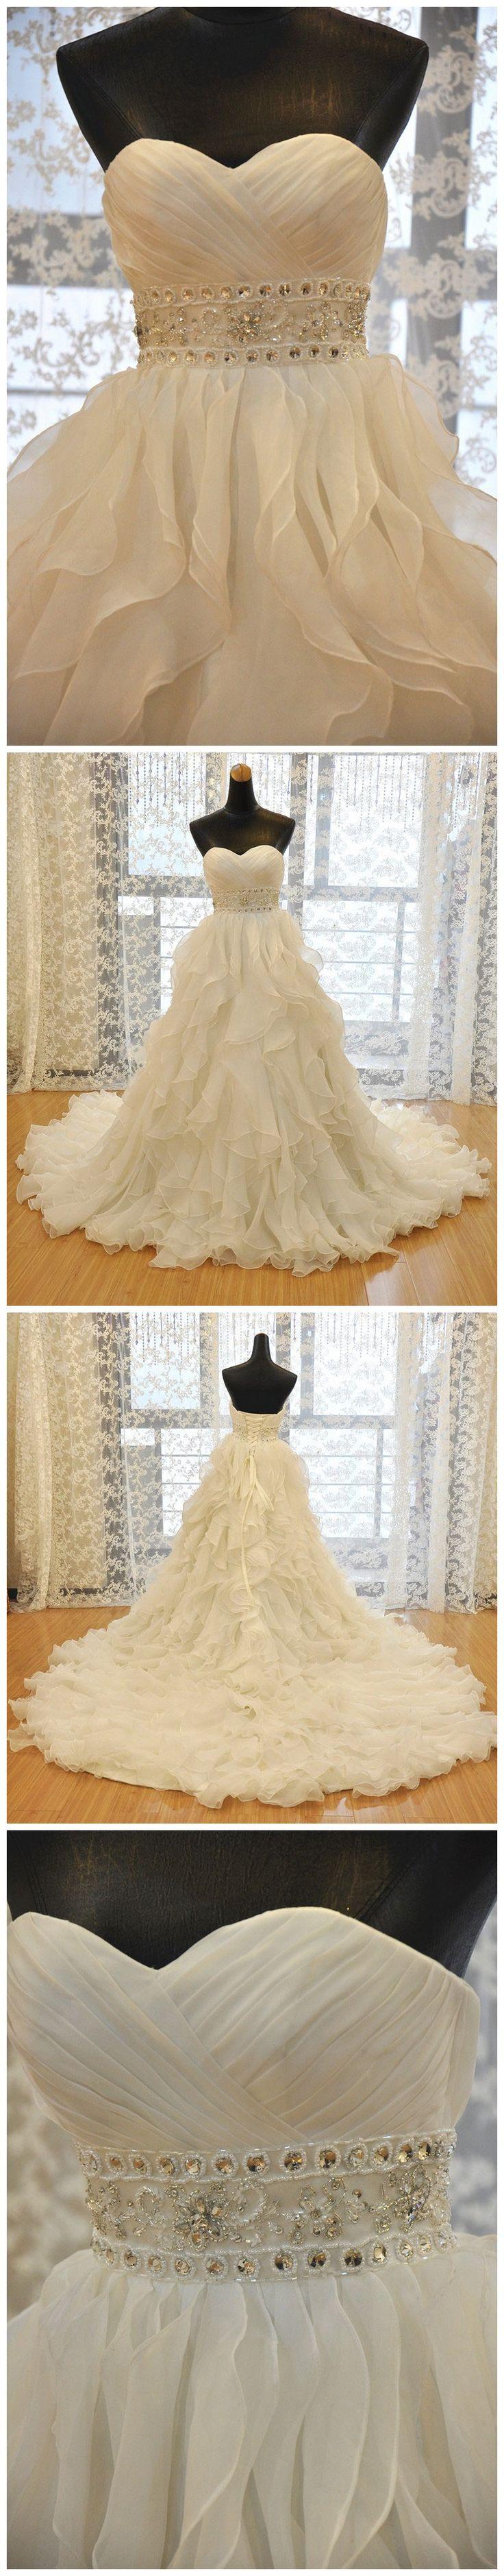 ball gown wedding dress,organza wedding dress,bridal wedding dress,royal wedding dress